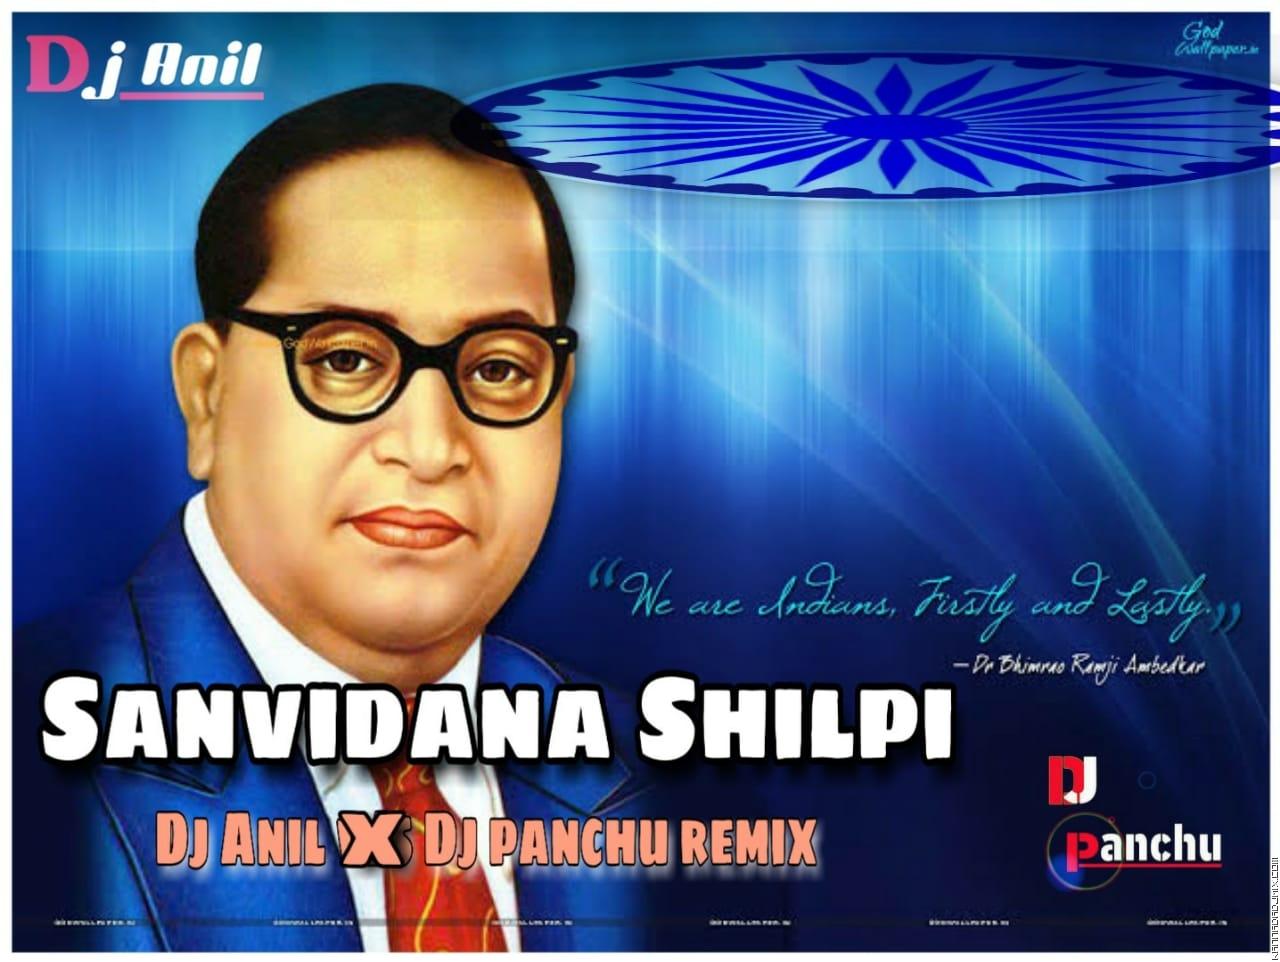 Sanveedana Shilpi Remix Dj Panchu X Dj Anil.mp3